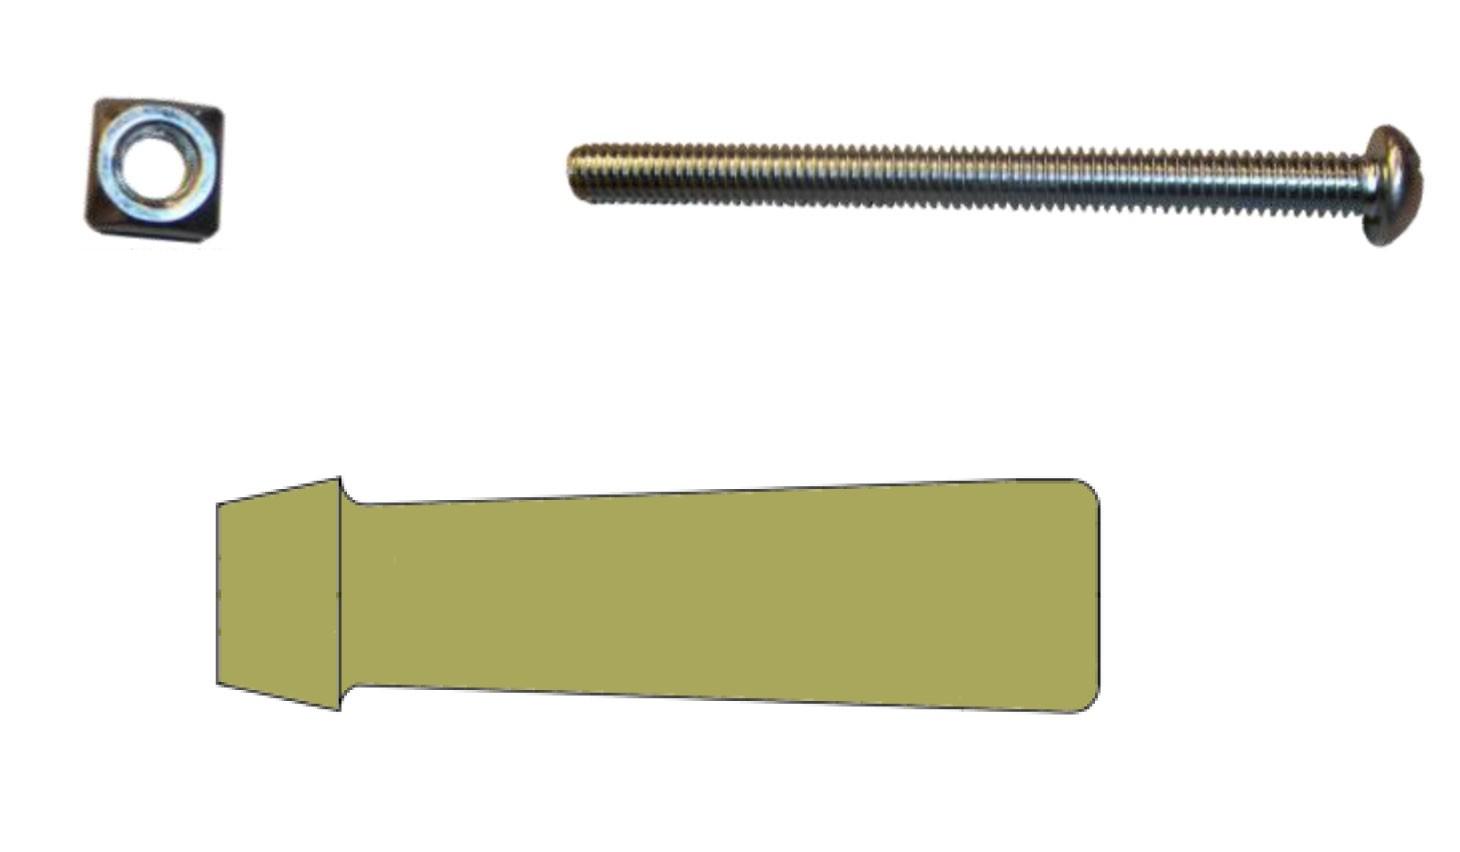 Fill-Rite KIT100WGP Bulk Wood Handle Kit (15 Wood Handles, 15 Handle Nuts, 15 Handle Bolts)